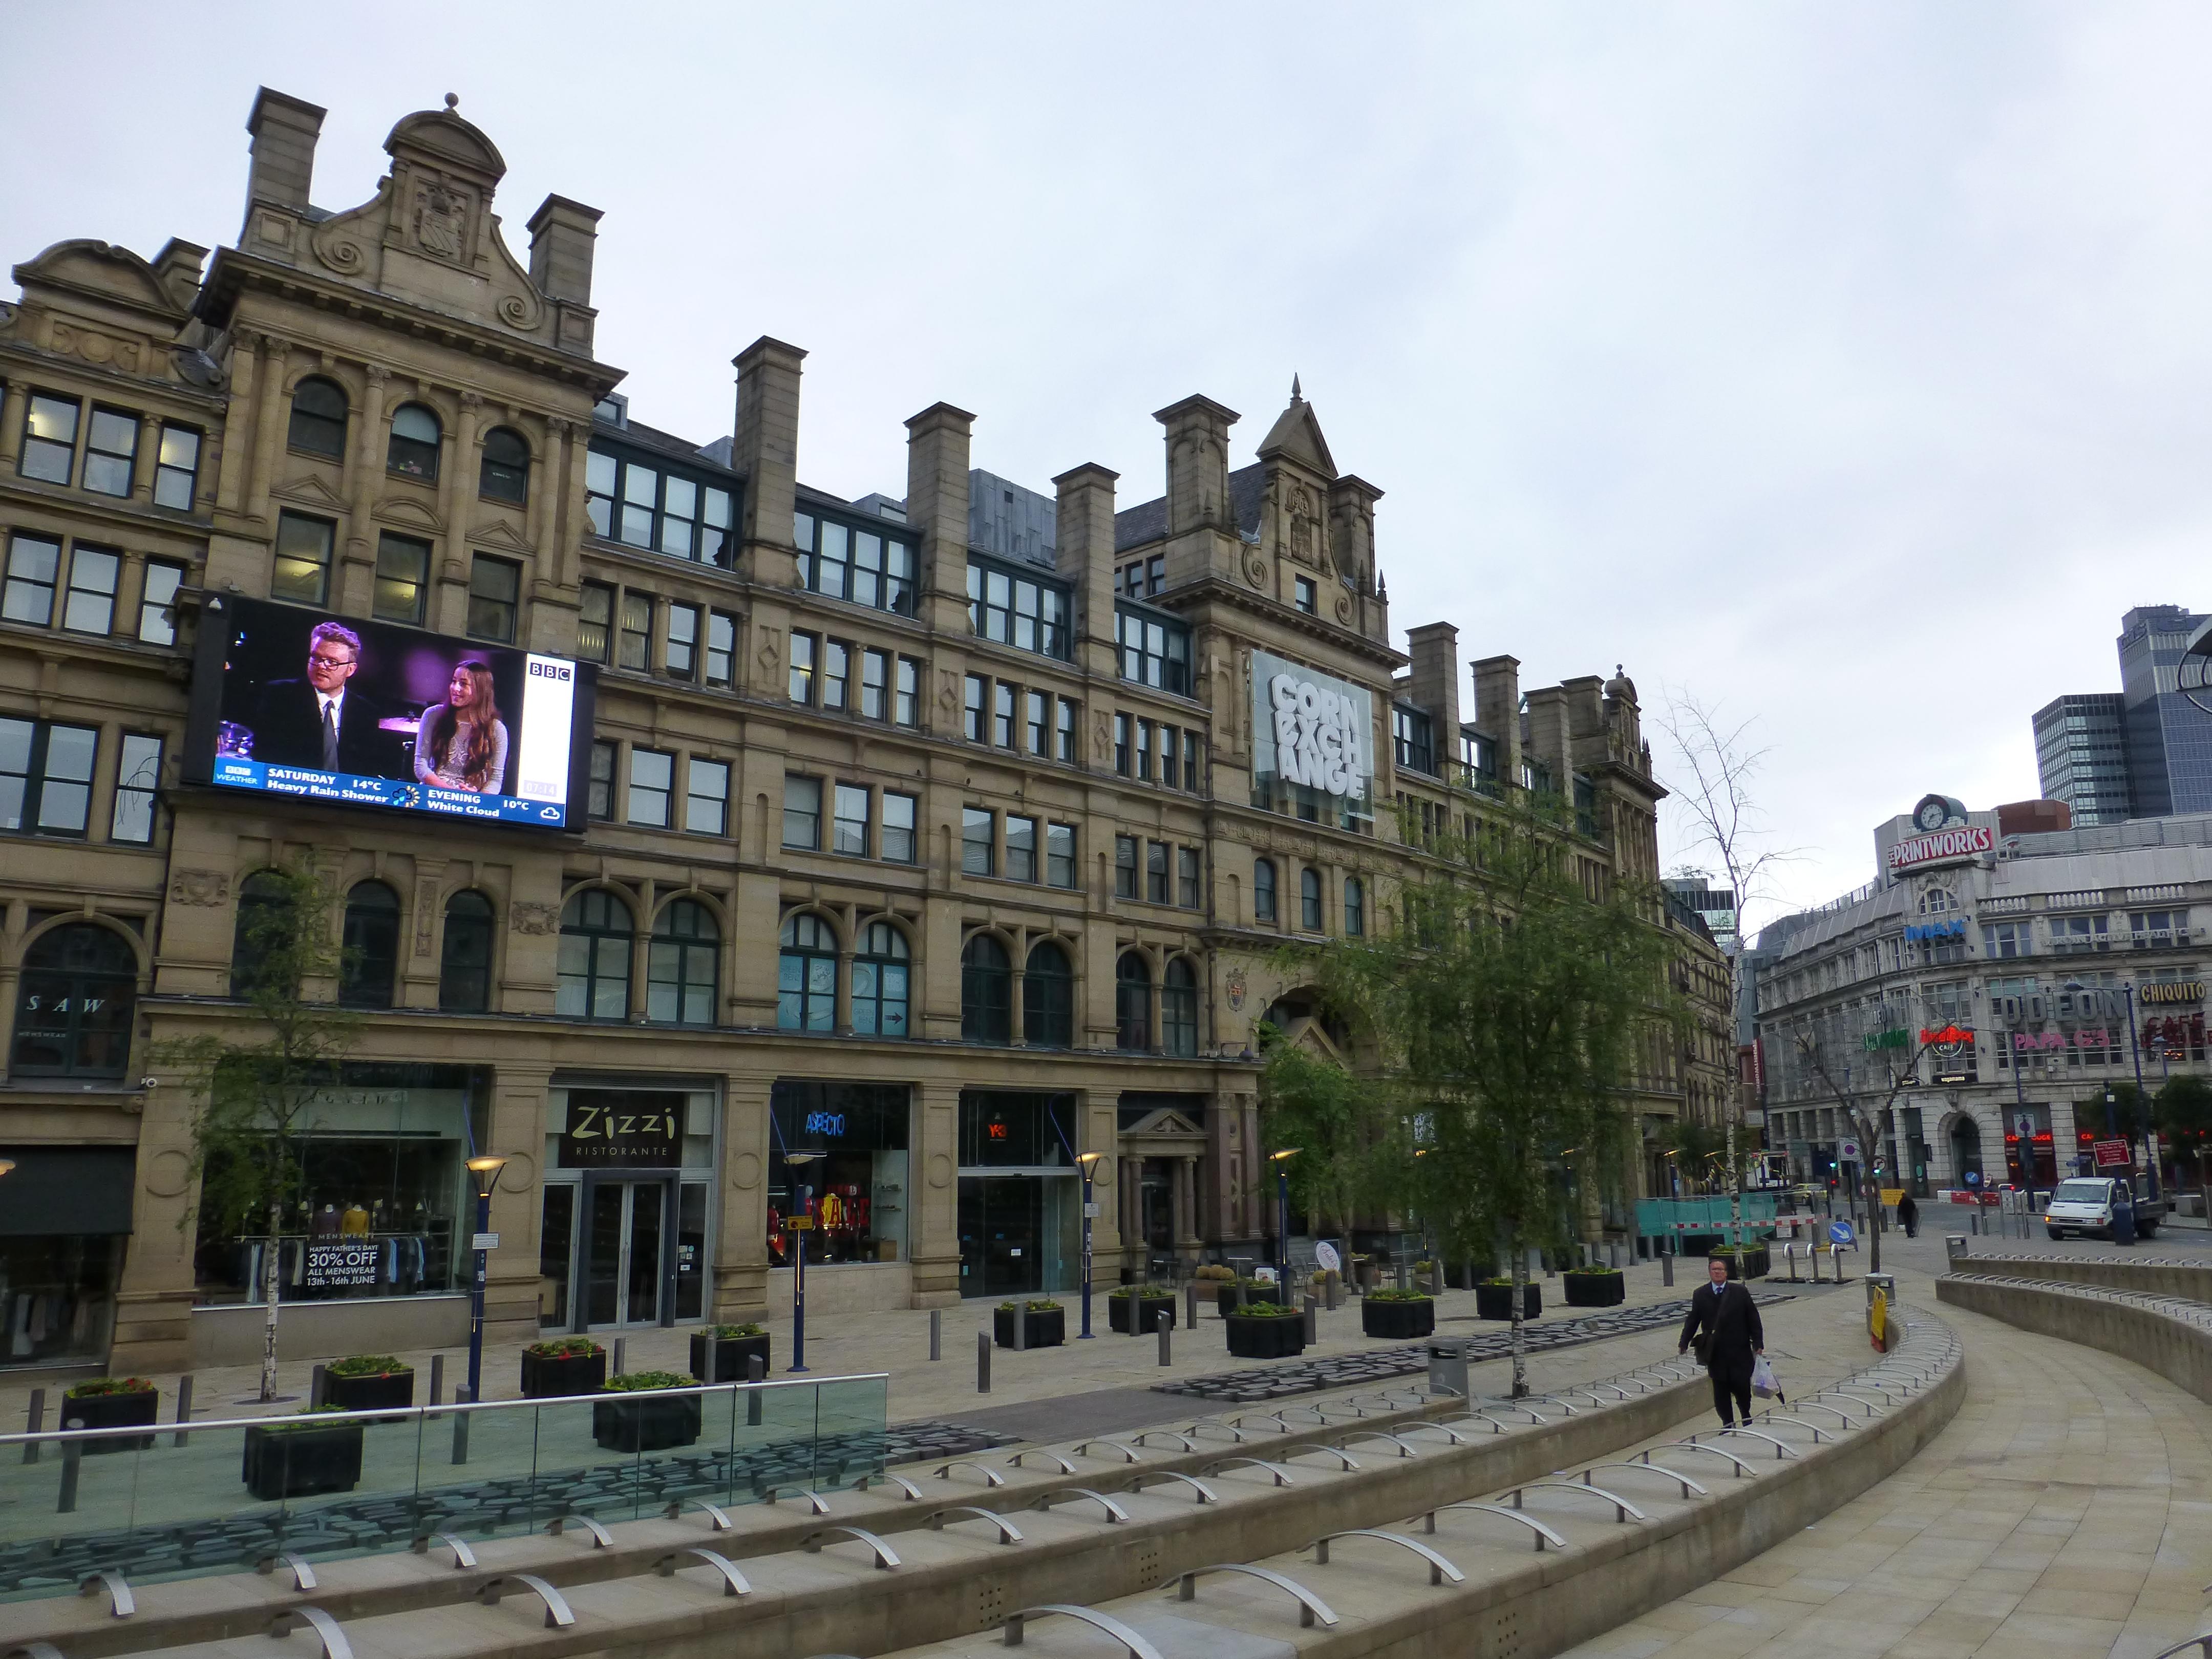 Hotel First Street Manchester